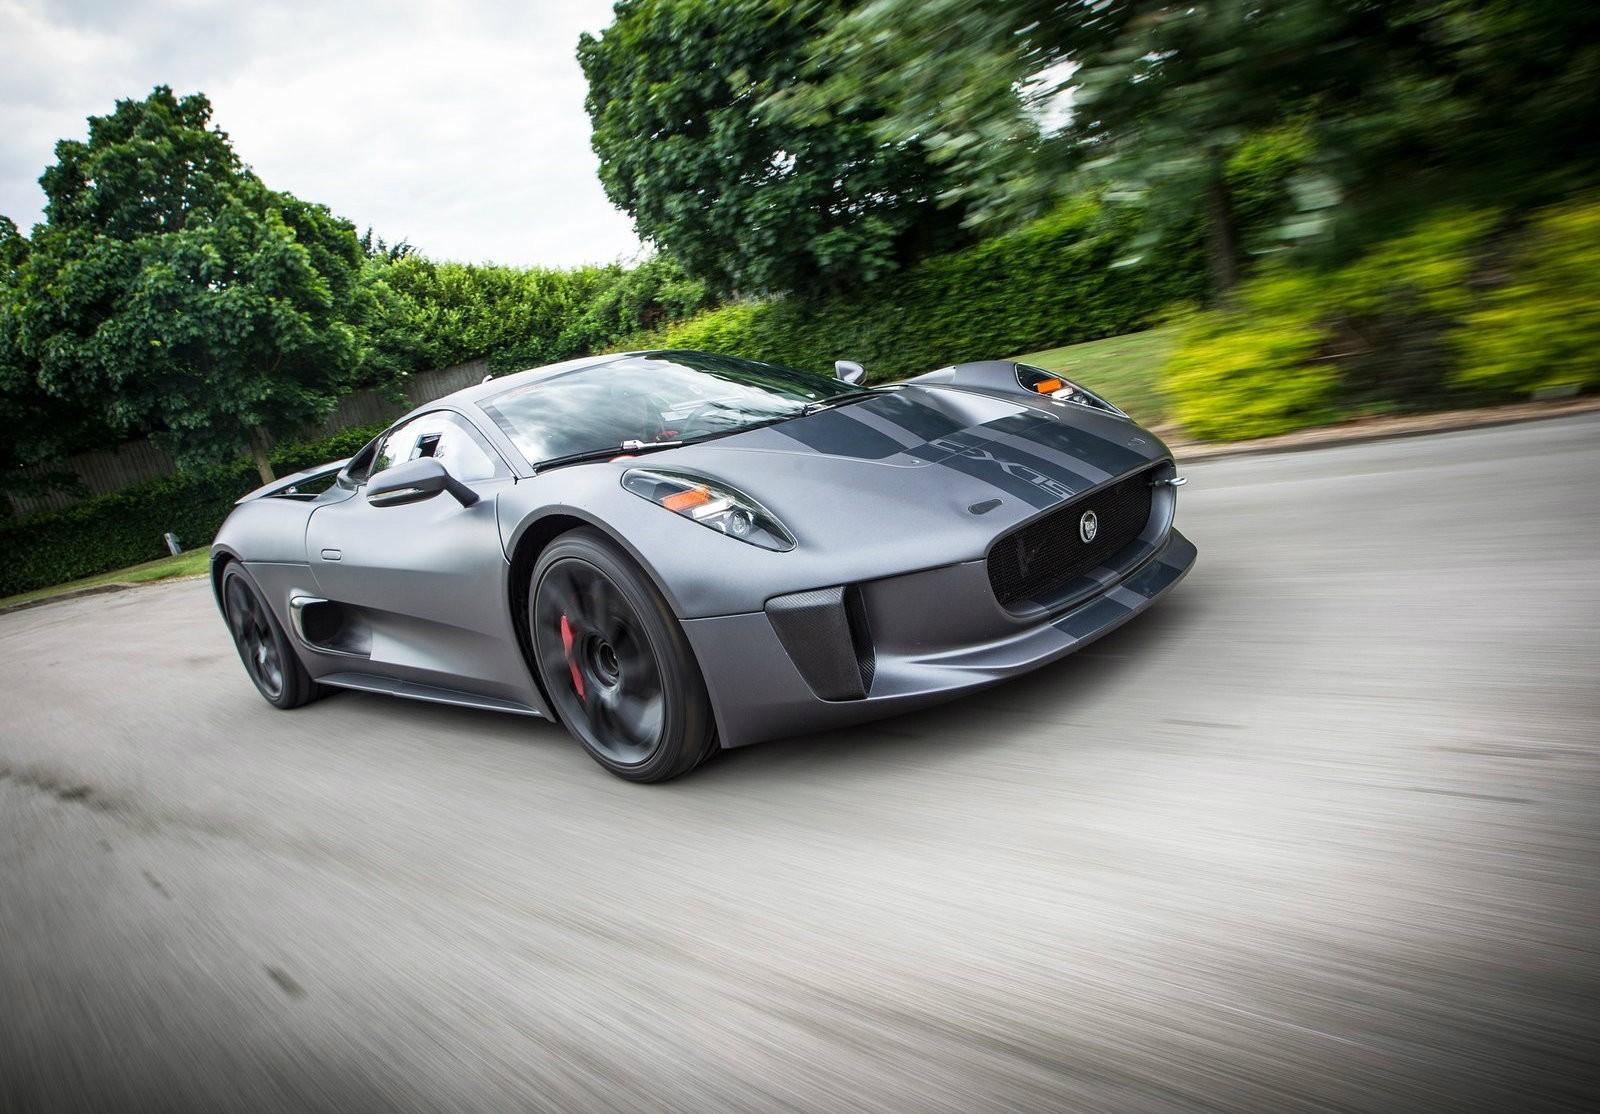 James Bond Spectre To Star Jaguar C X75 It S The Baddie S